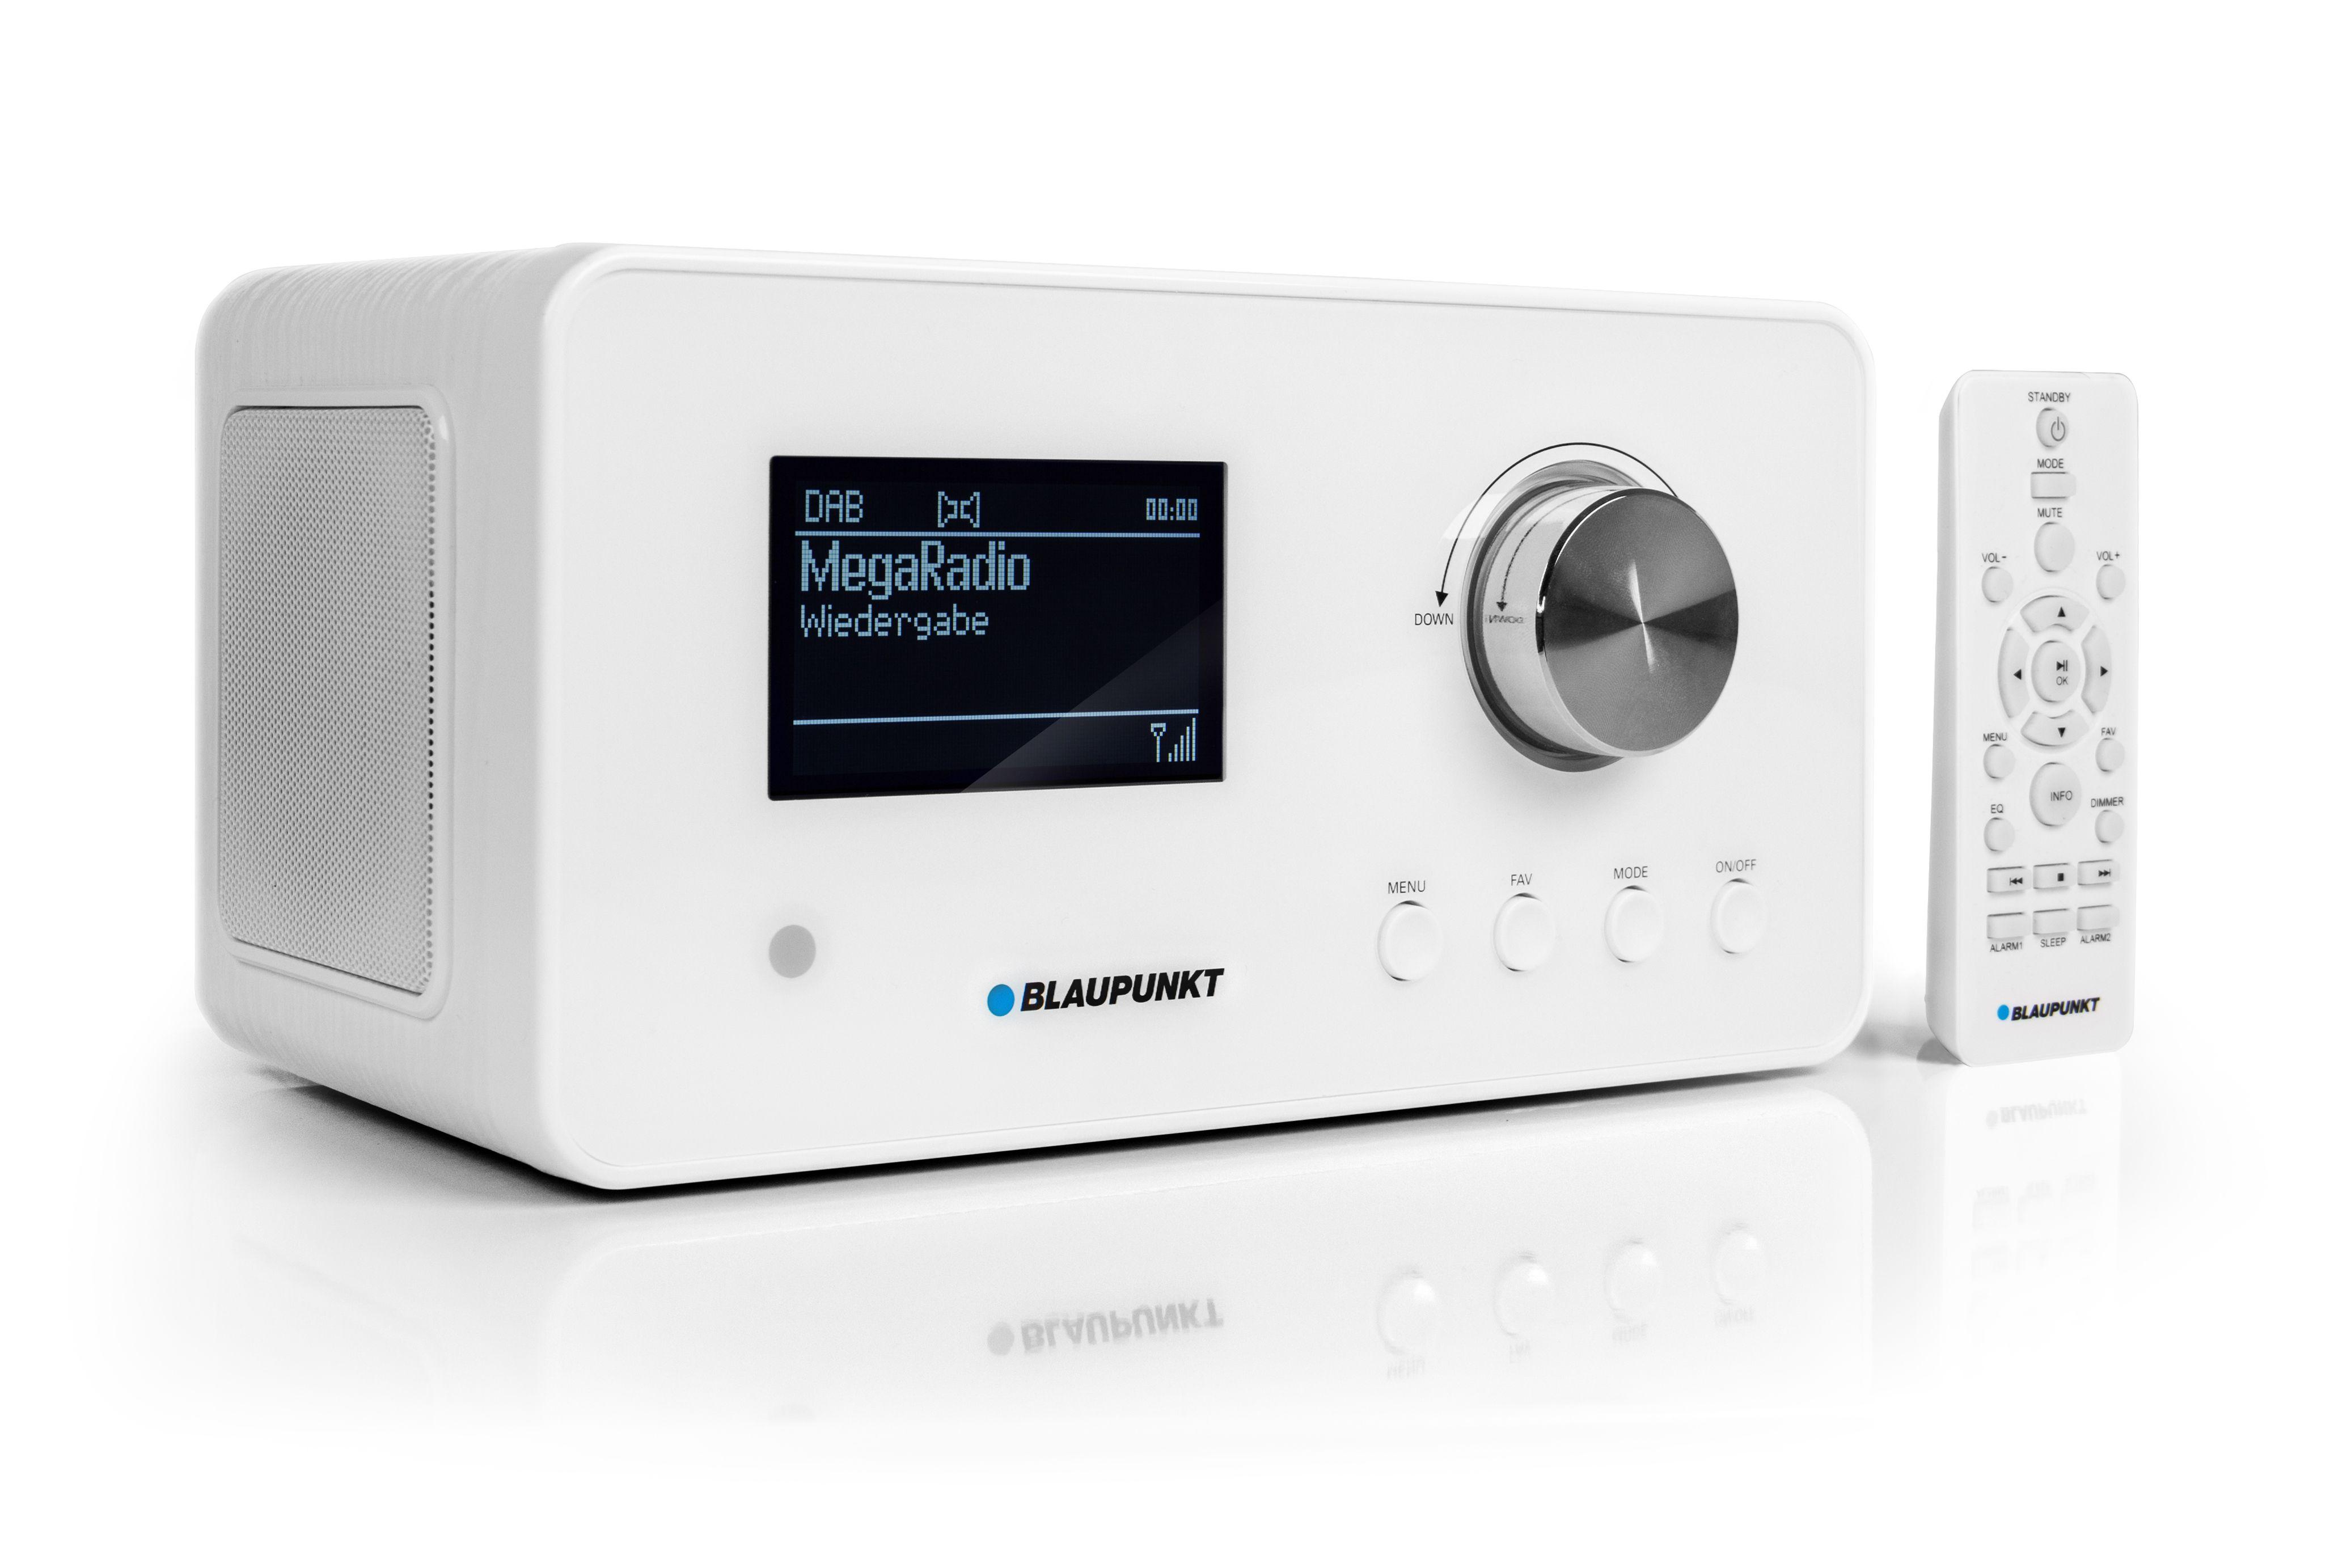 BLAUPUNKT IDR 20 incl. DAB+   Digitales radio, Radios, Badezimmer ...